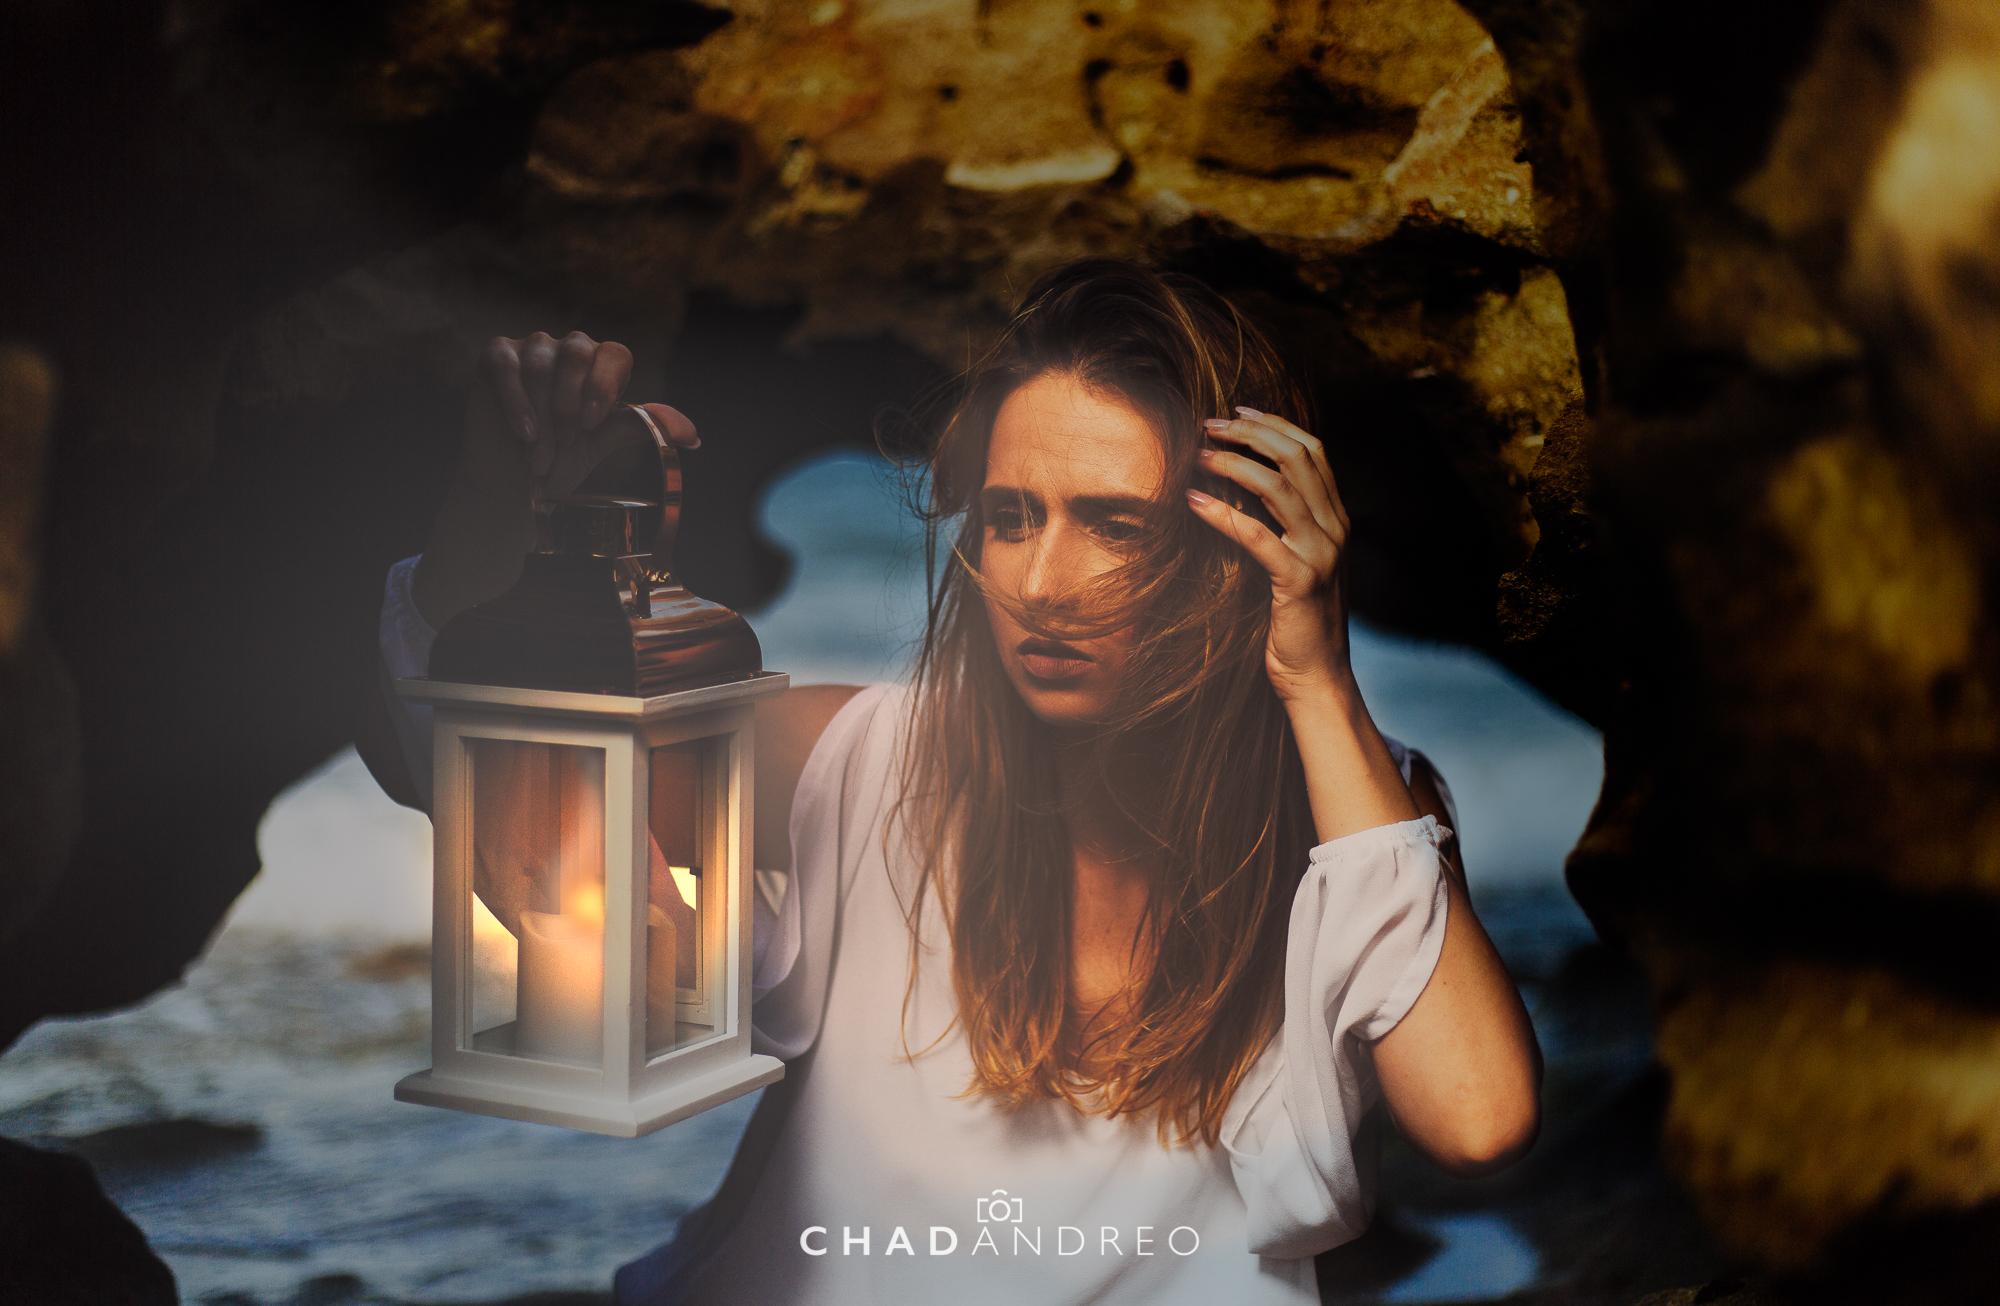 Chad-Andreo-Miami-Photographer-22661-Edit.jpg